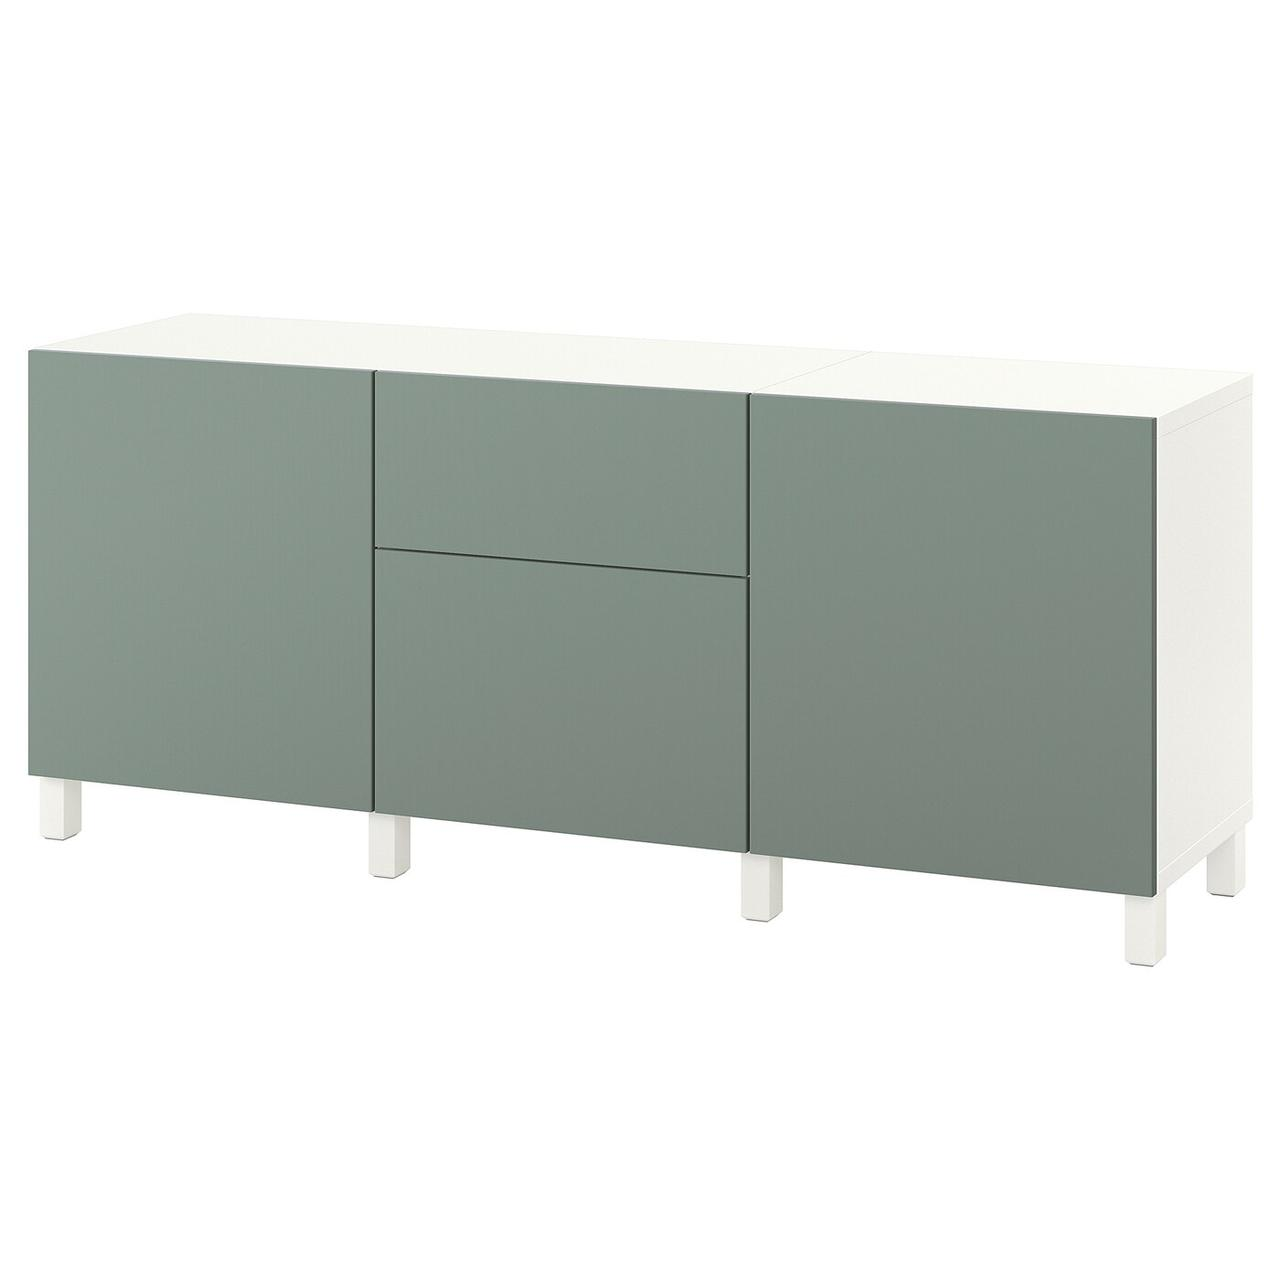 IKEA BESTÅ Комбінація з ящиками/Notviken/Stubbarp полину 180x42x74 см